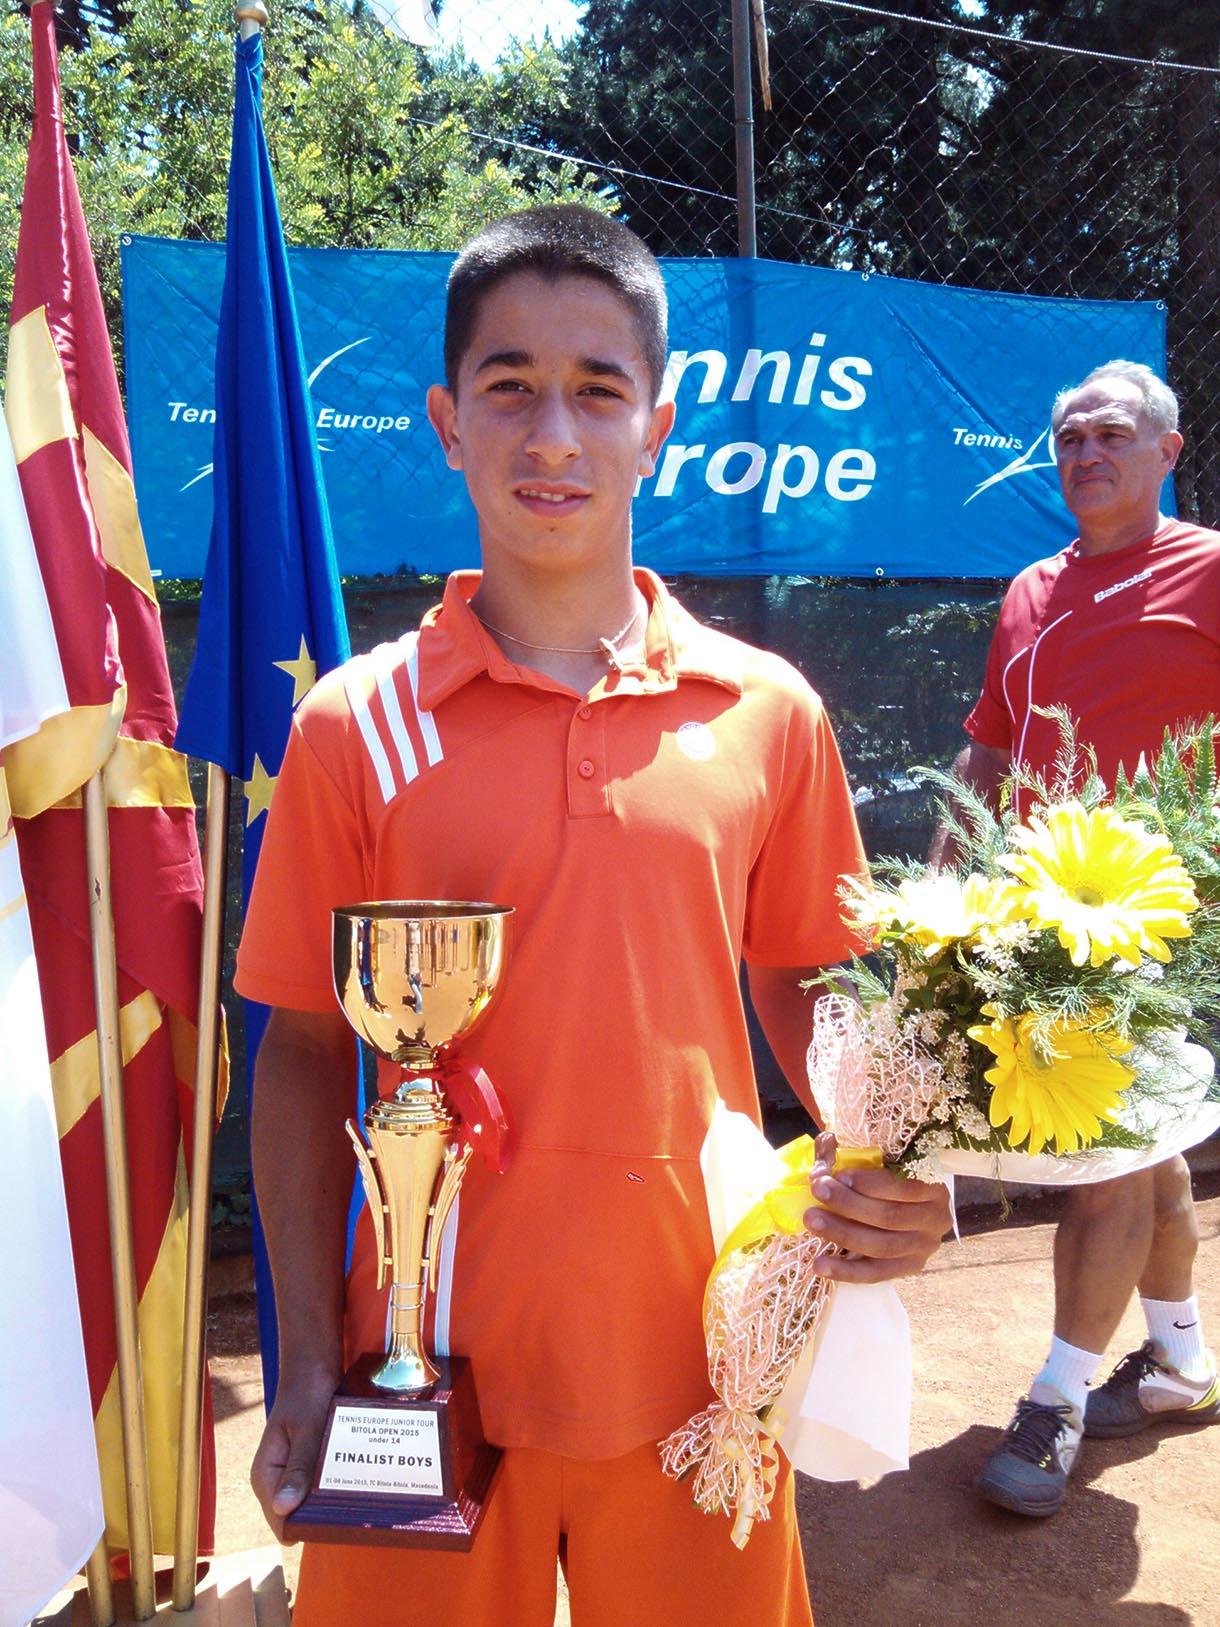 Luka Stefanović nastavlja seriju uspeha na Tennis Europe turnirima